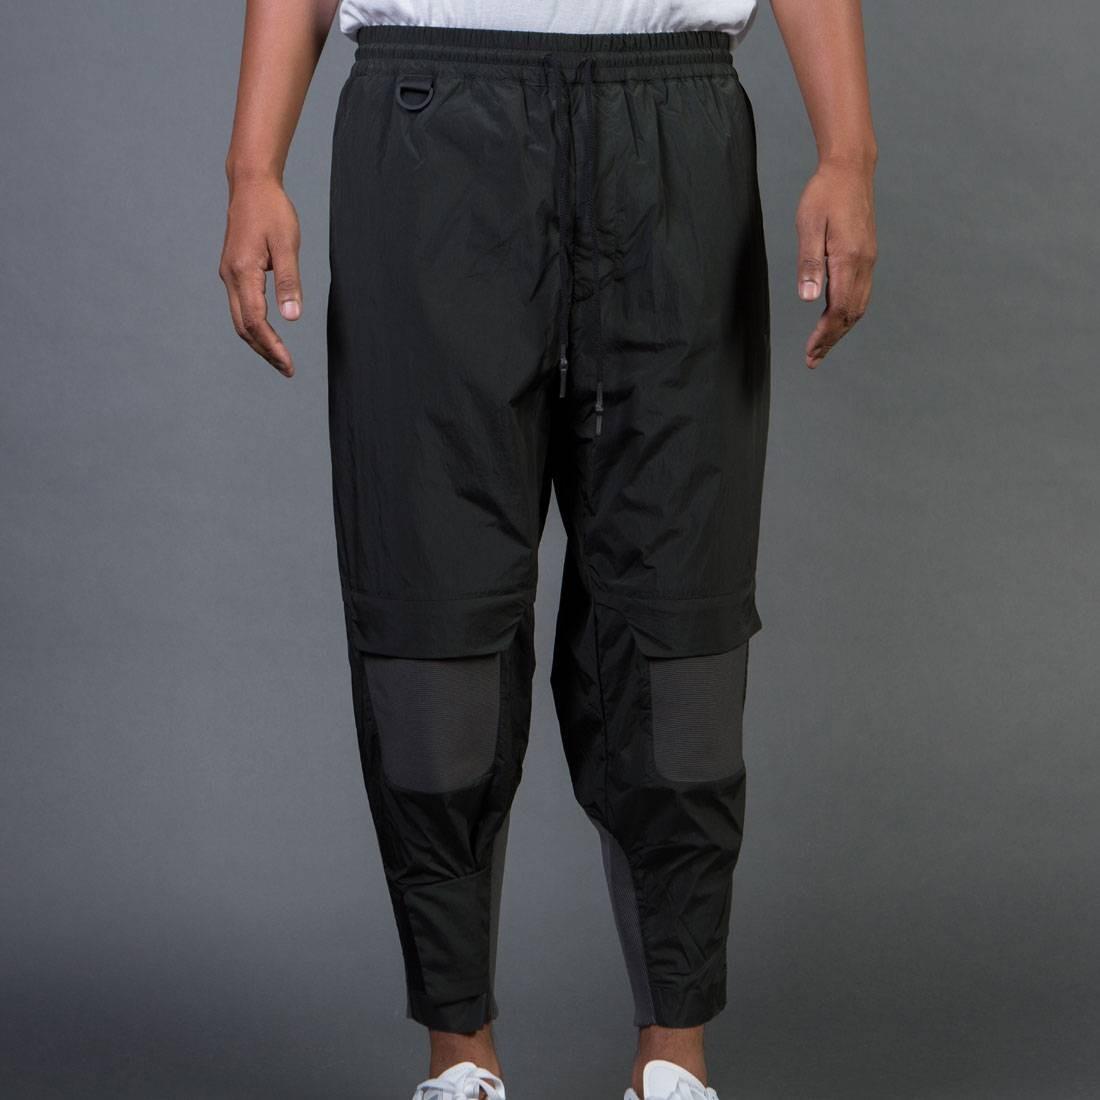 trabajo esperanza Hazlo pesado  Adidas Y-3 Men Nylon Rib Pants olive dark black olive